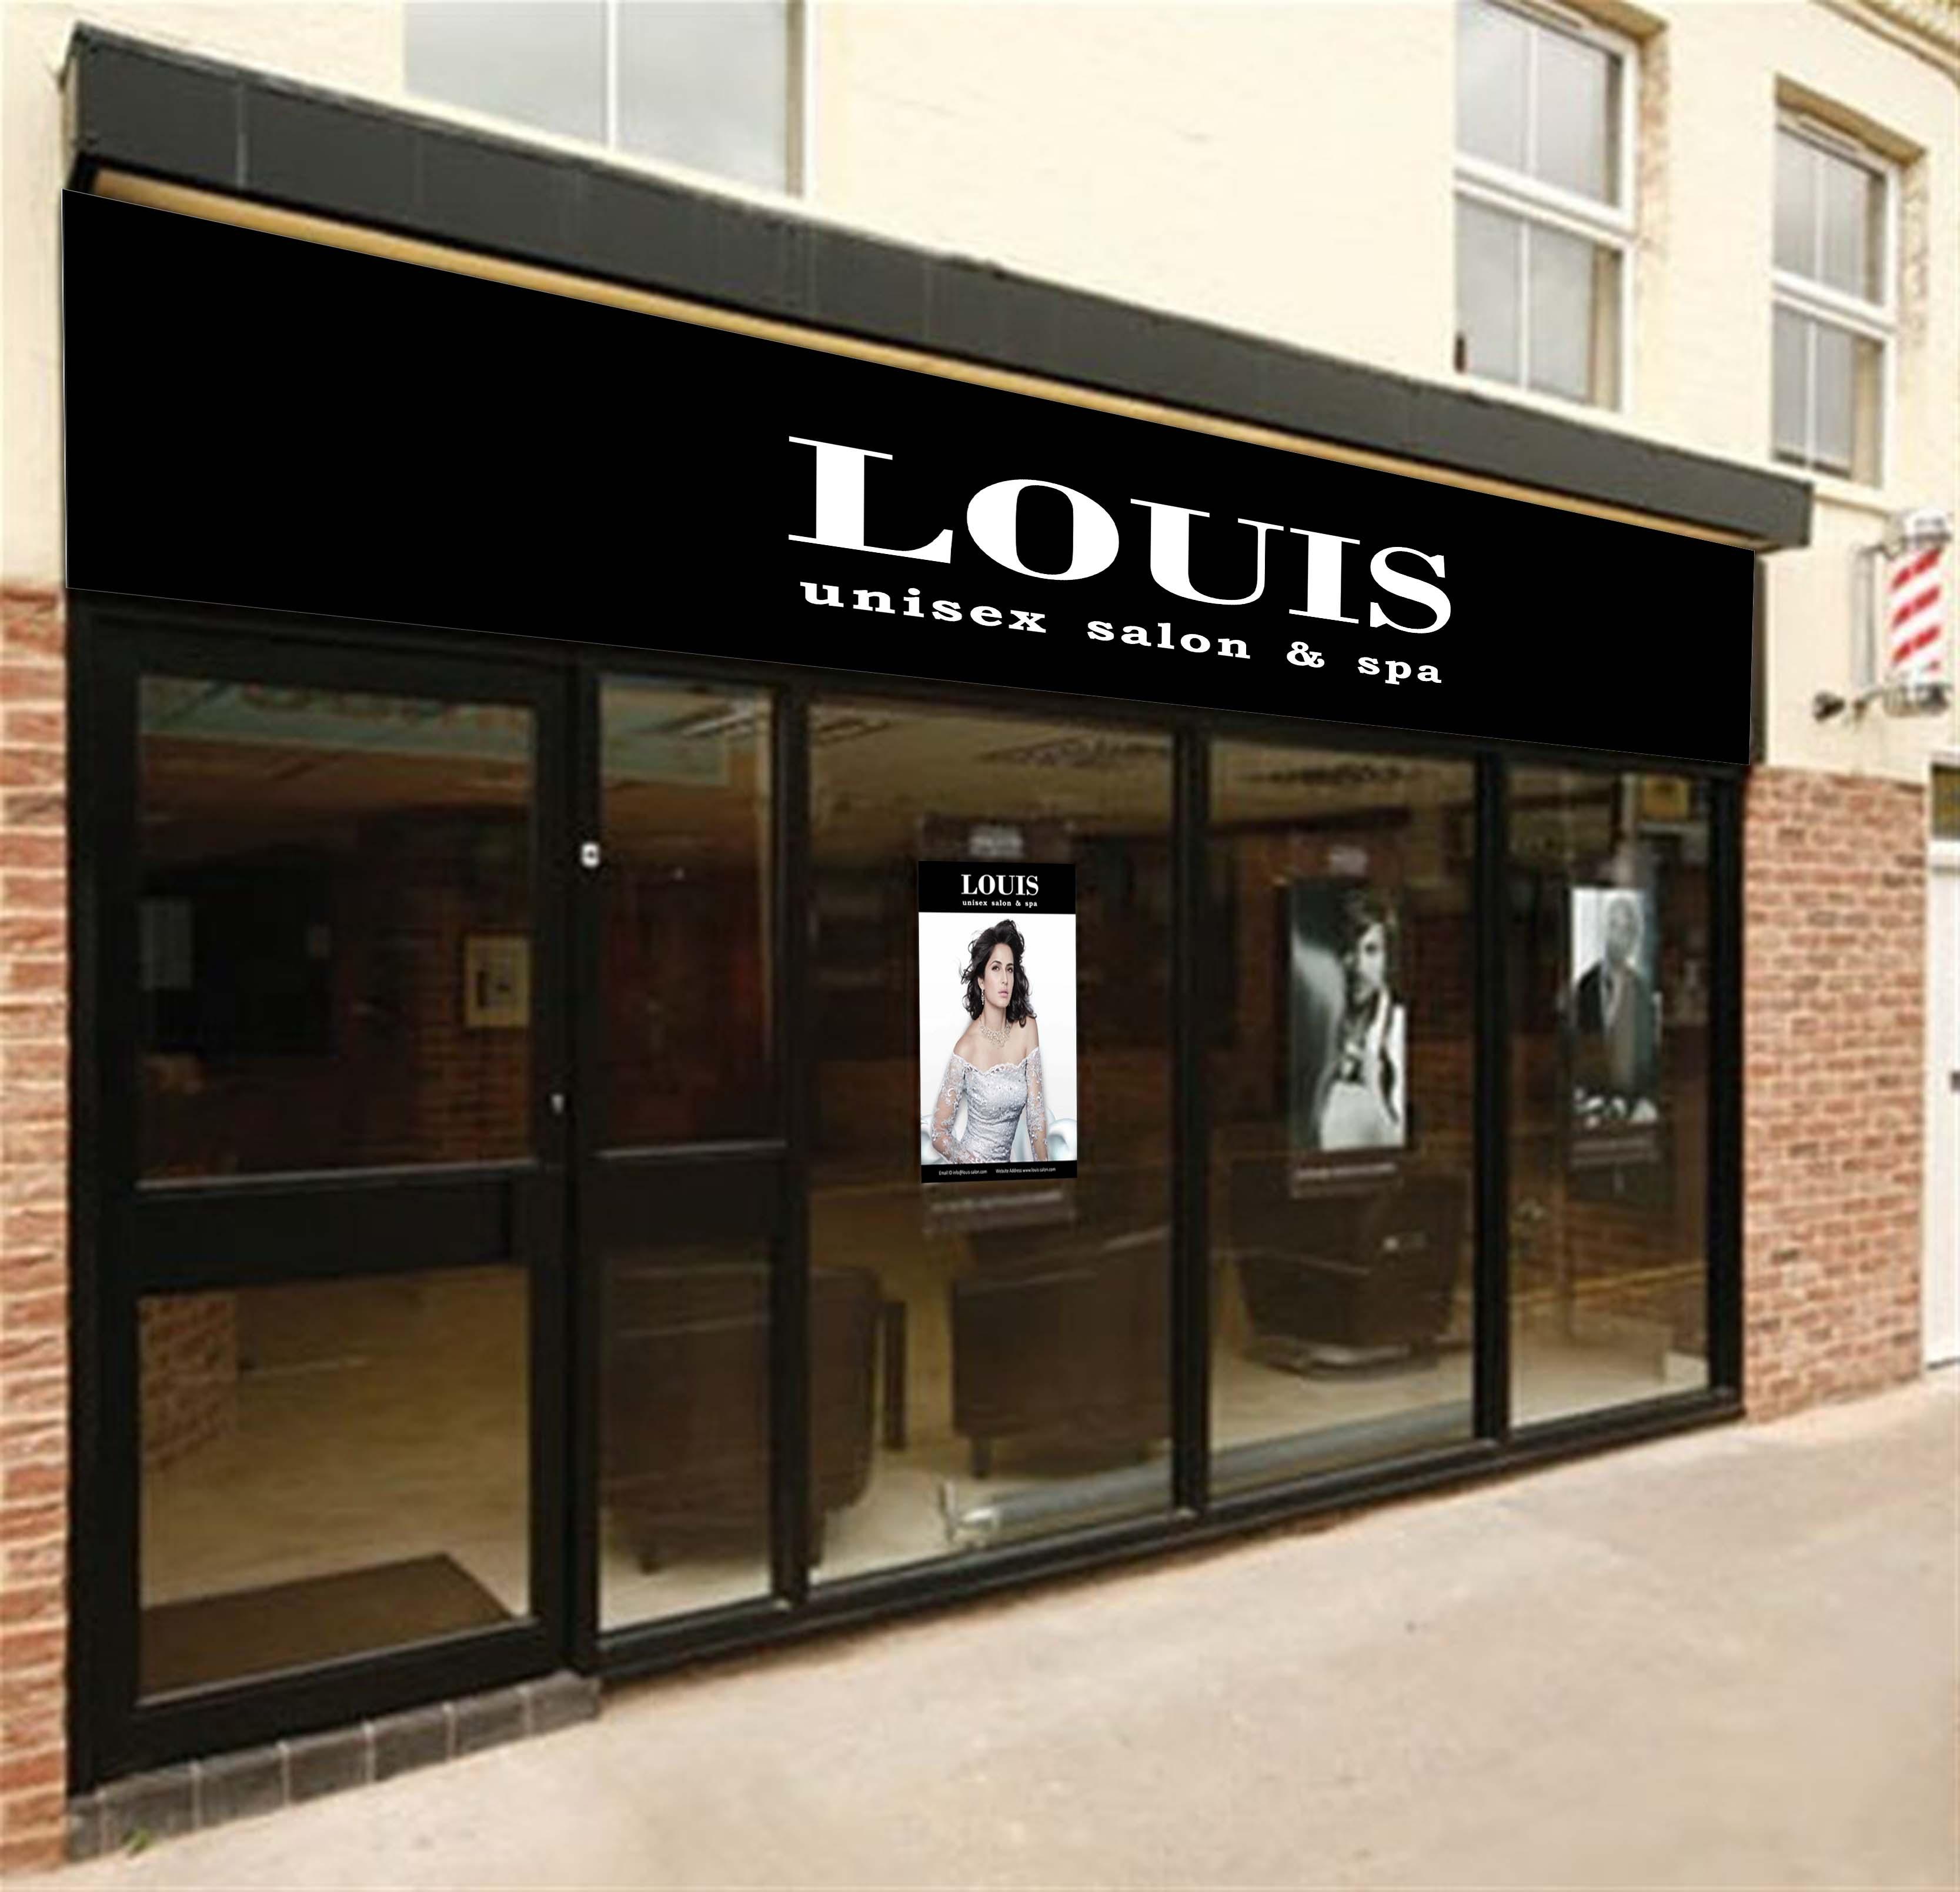 louis+unisex+salon+dubai30 (25)